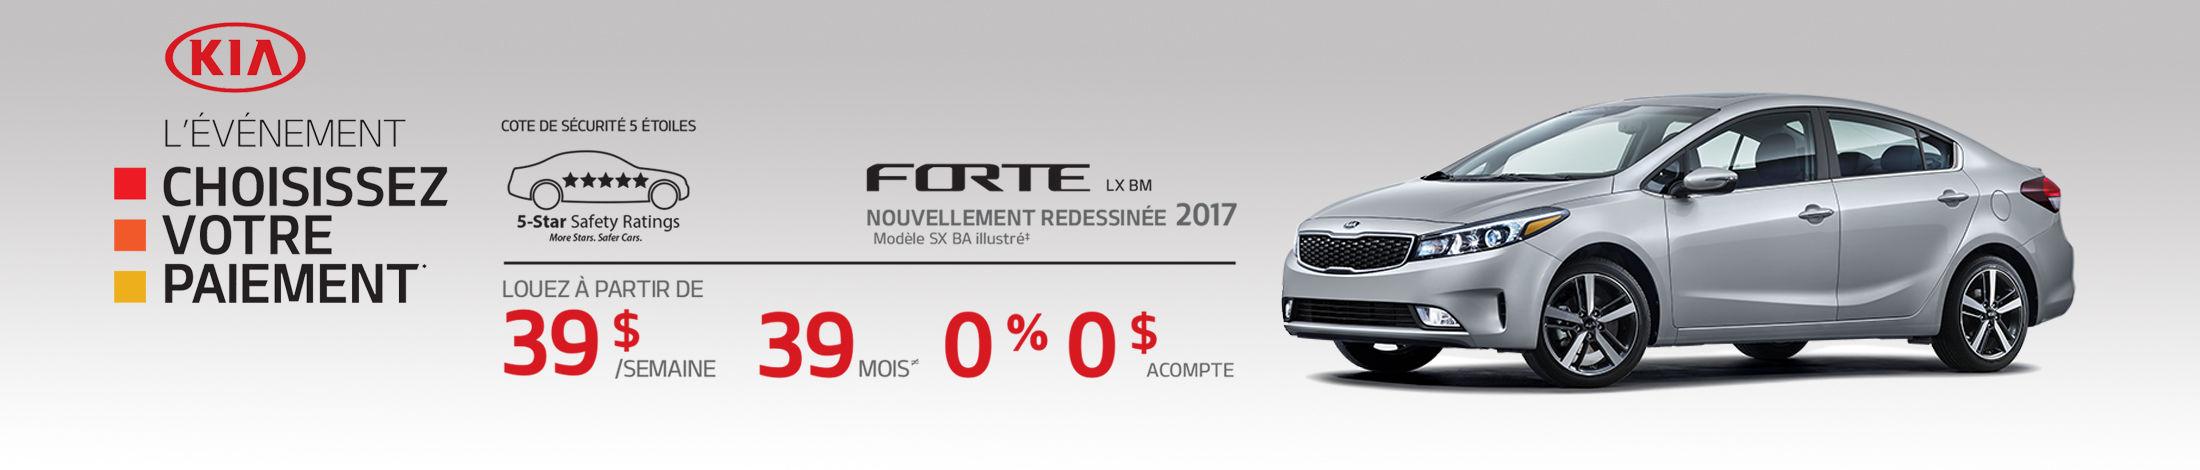 Kia Forte Promotion Mai banner